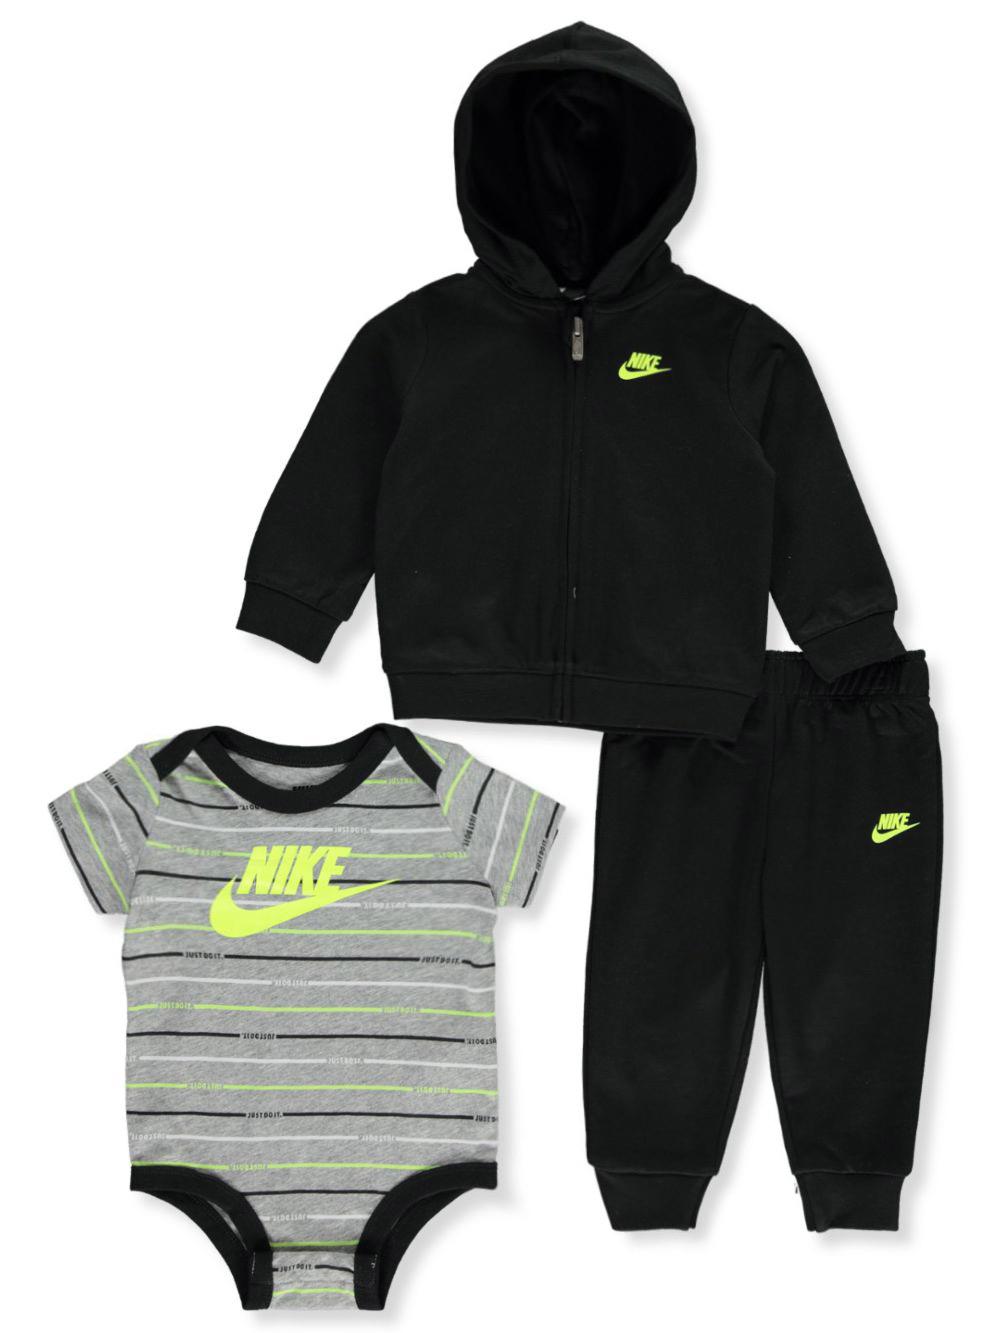 Nike Baby Boys' French Terry 3-Piece